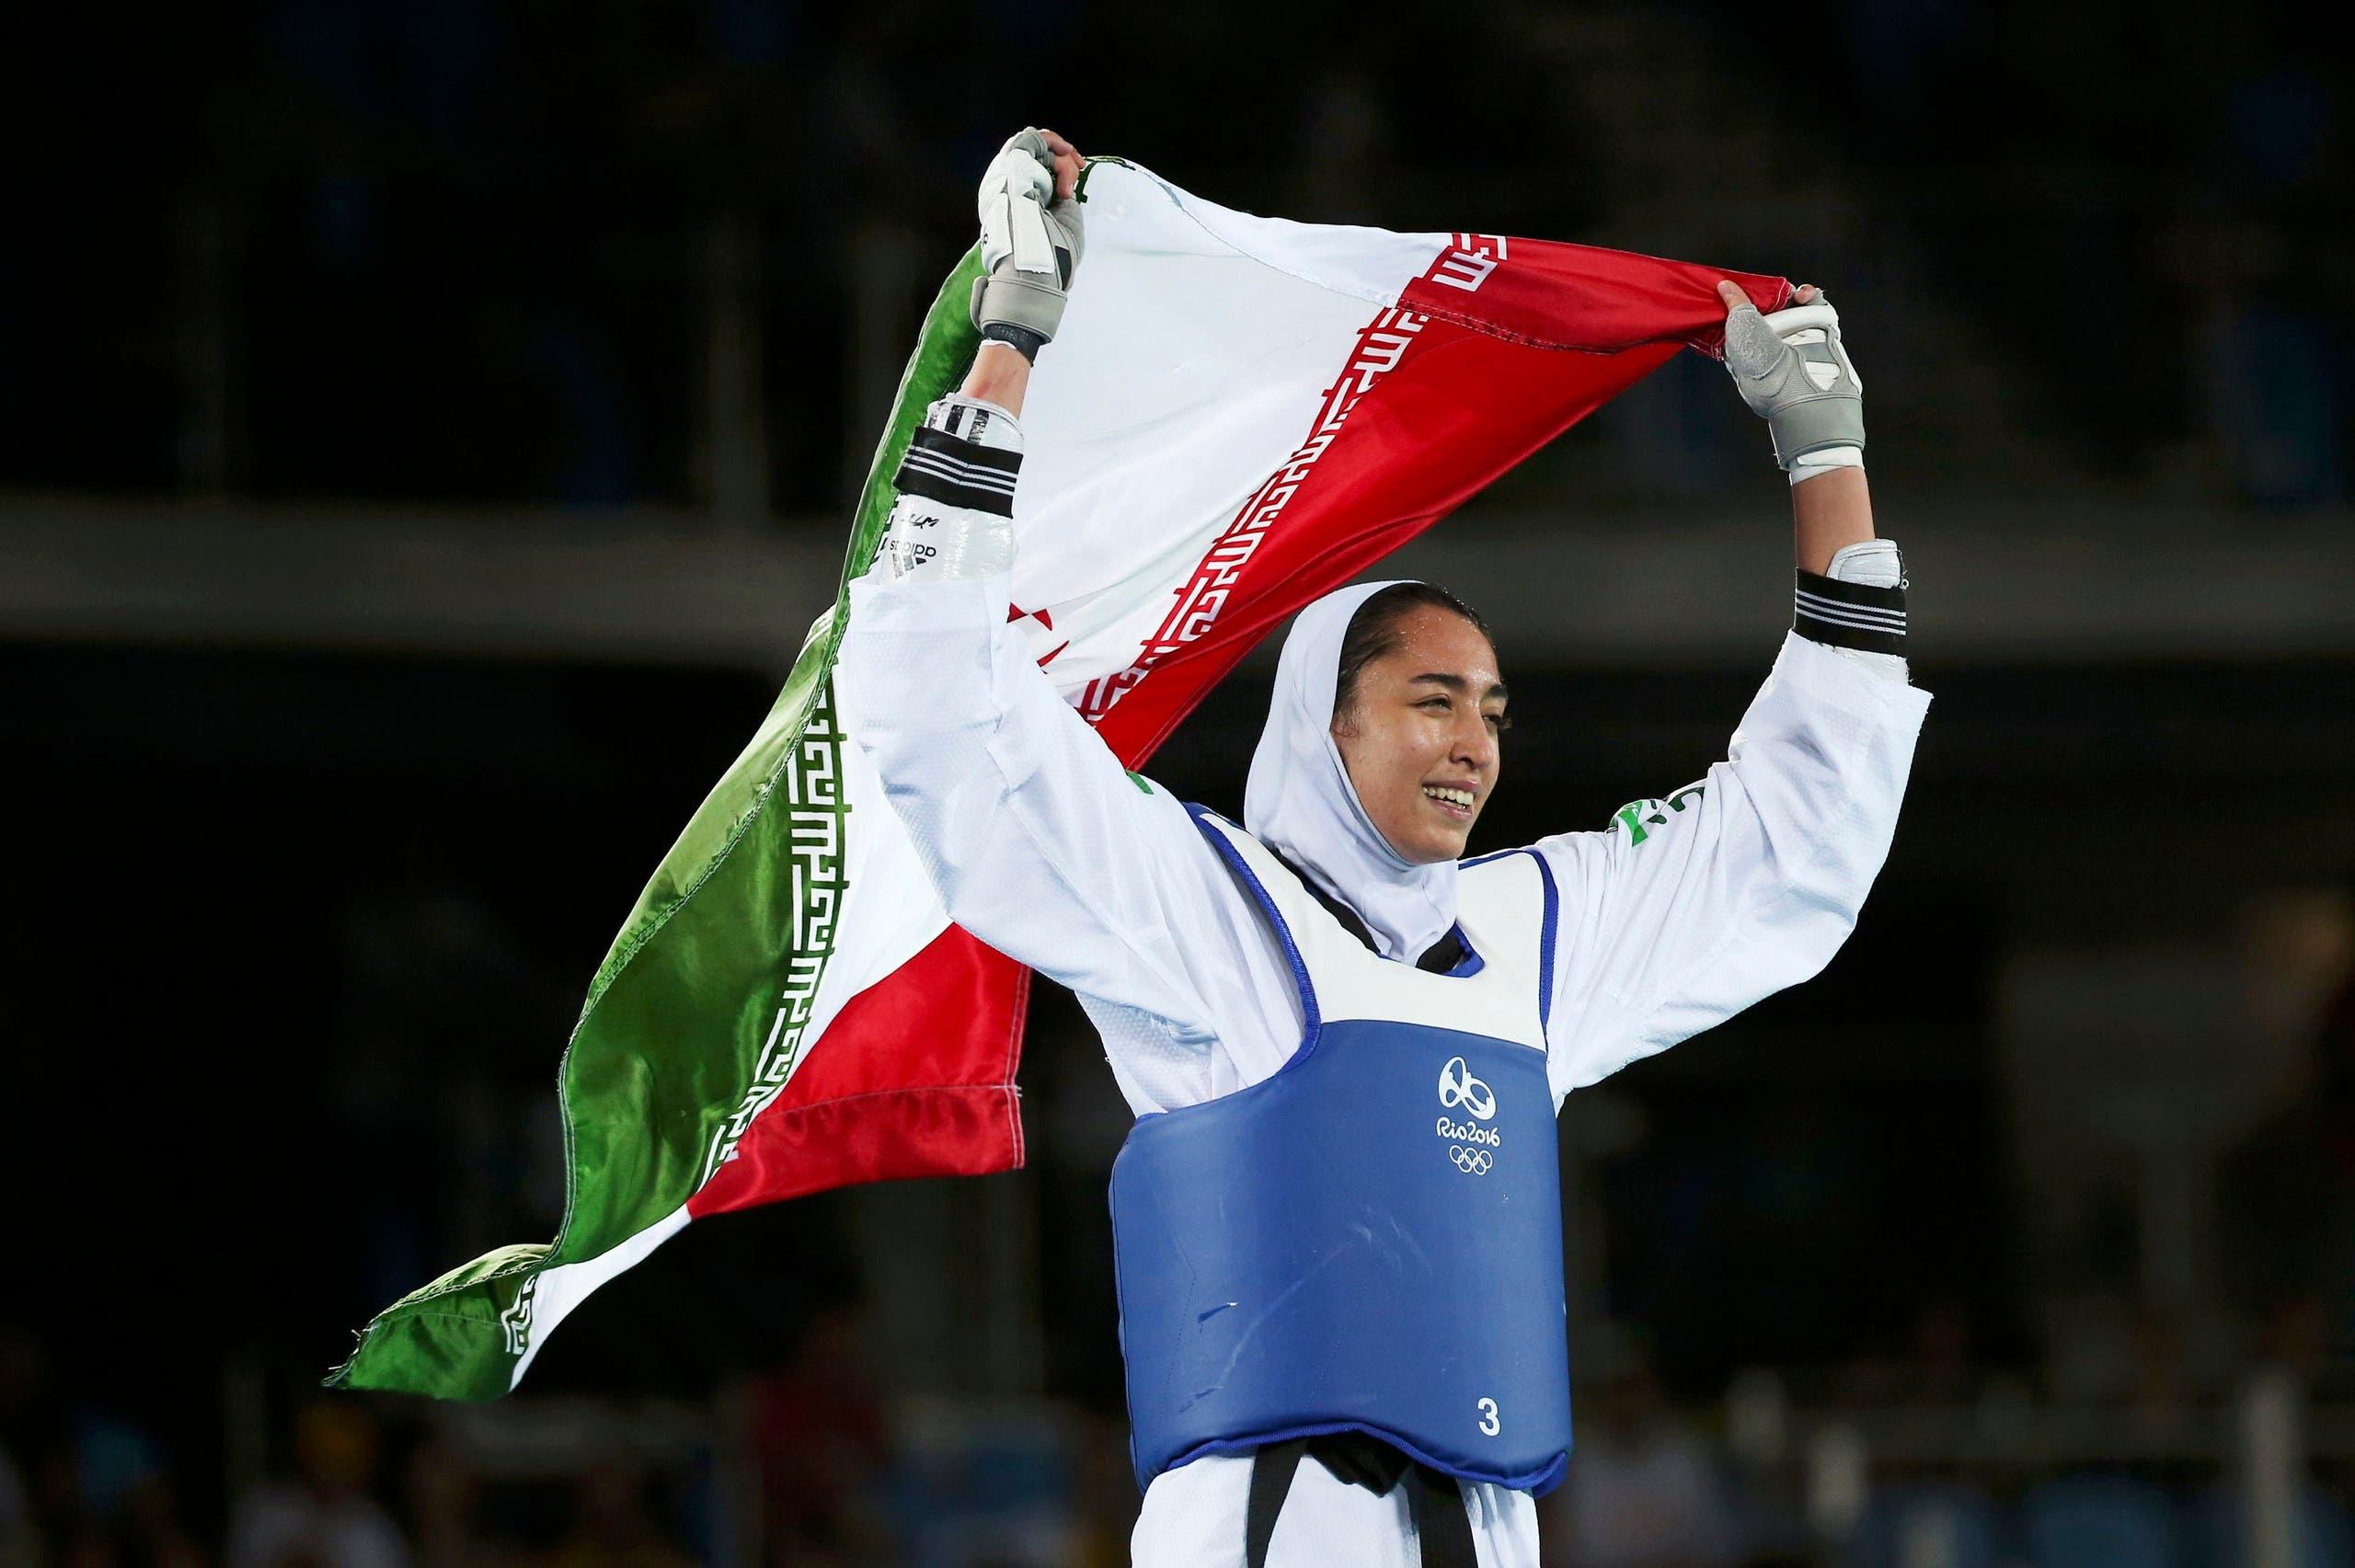 Kimia Alizadeh Zenoorin (IRI) of Iran celebrates. (Reuters)